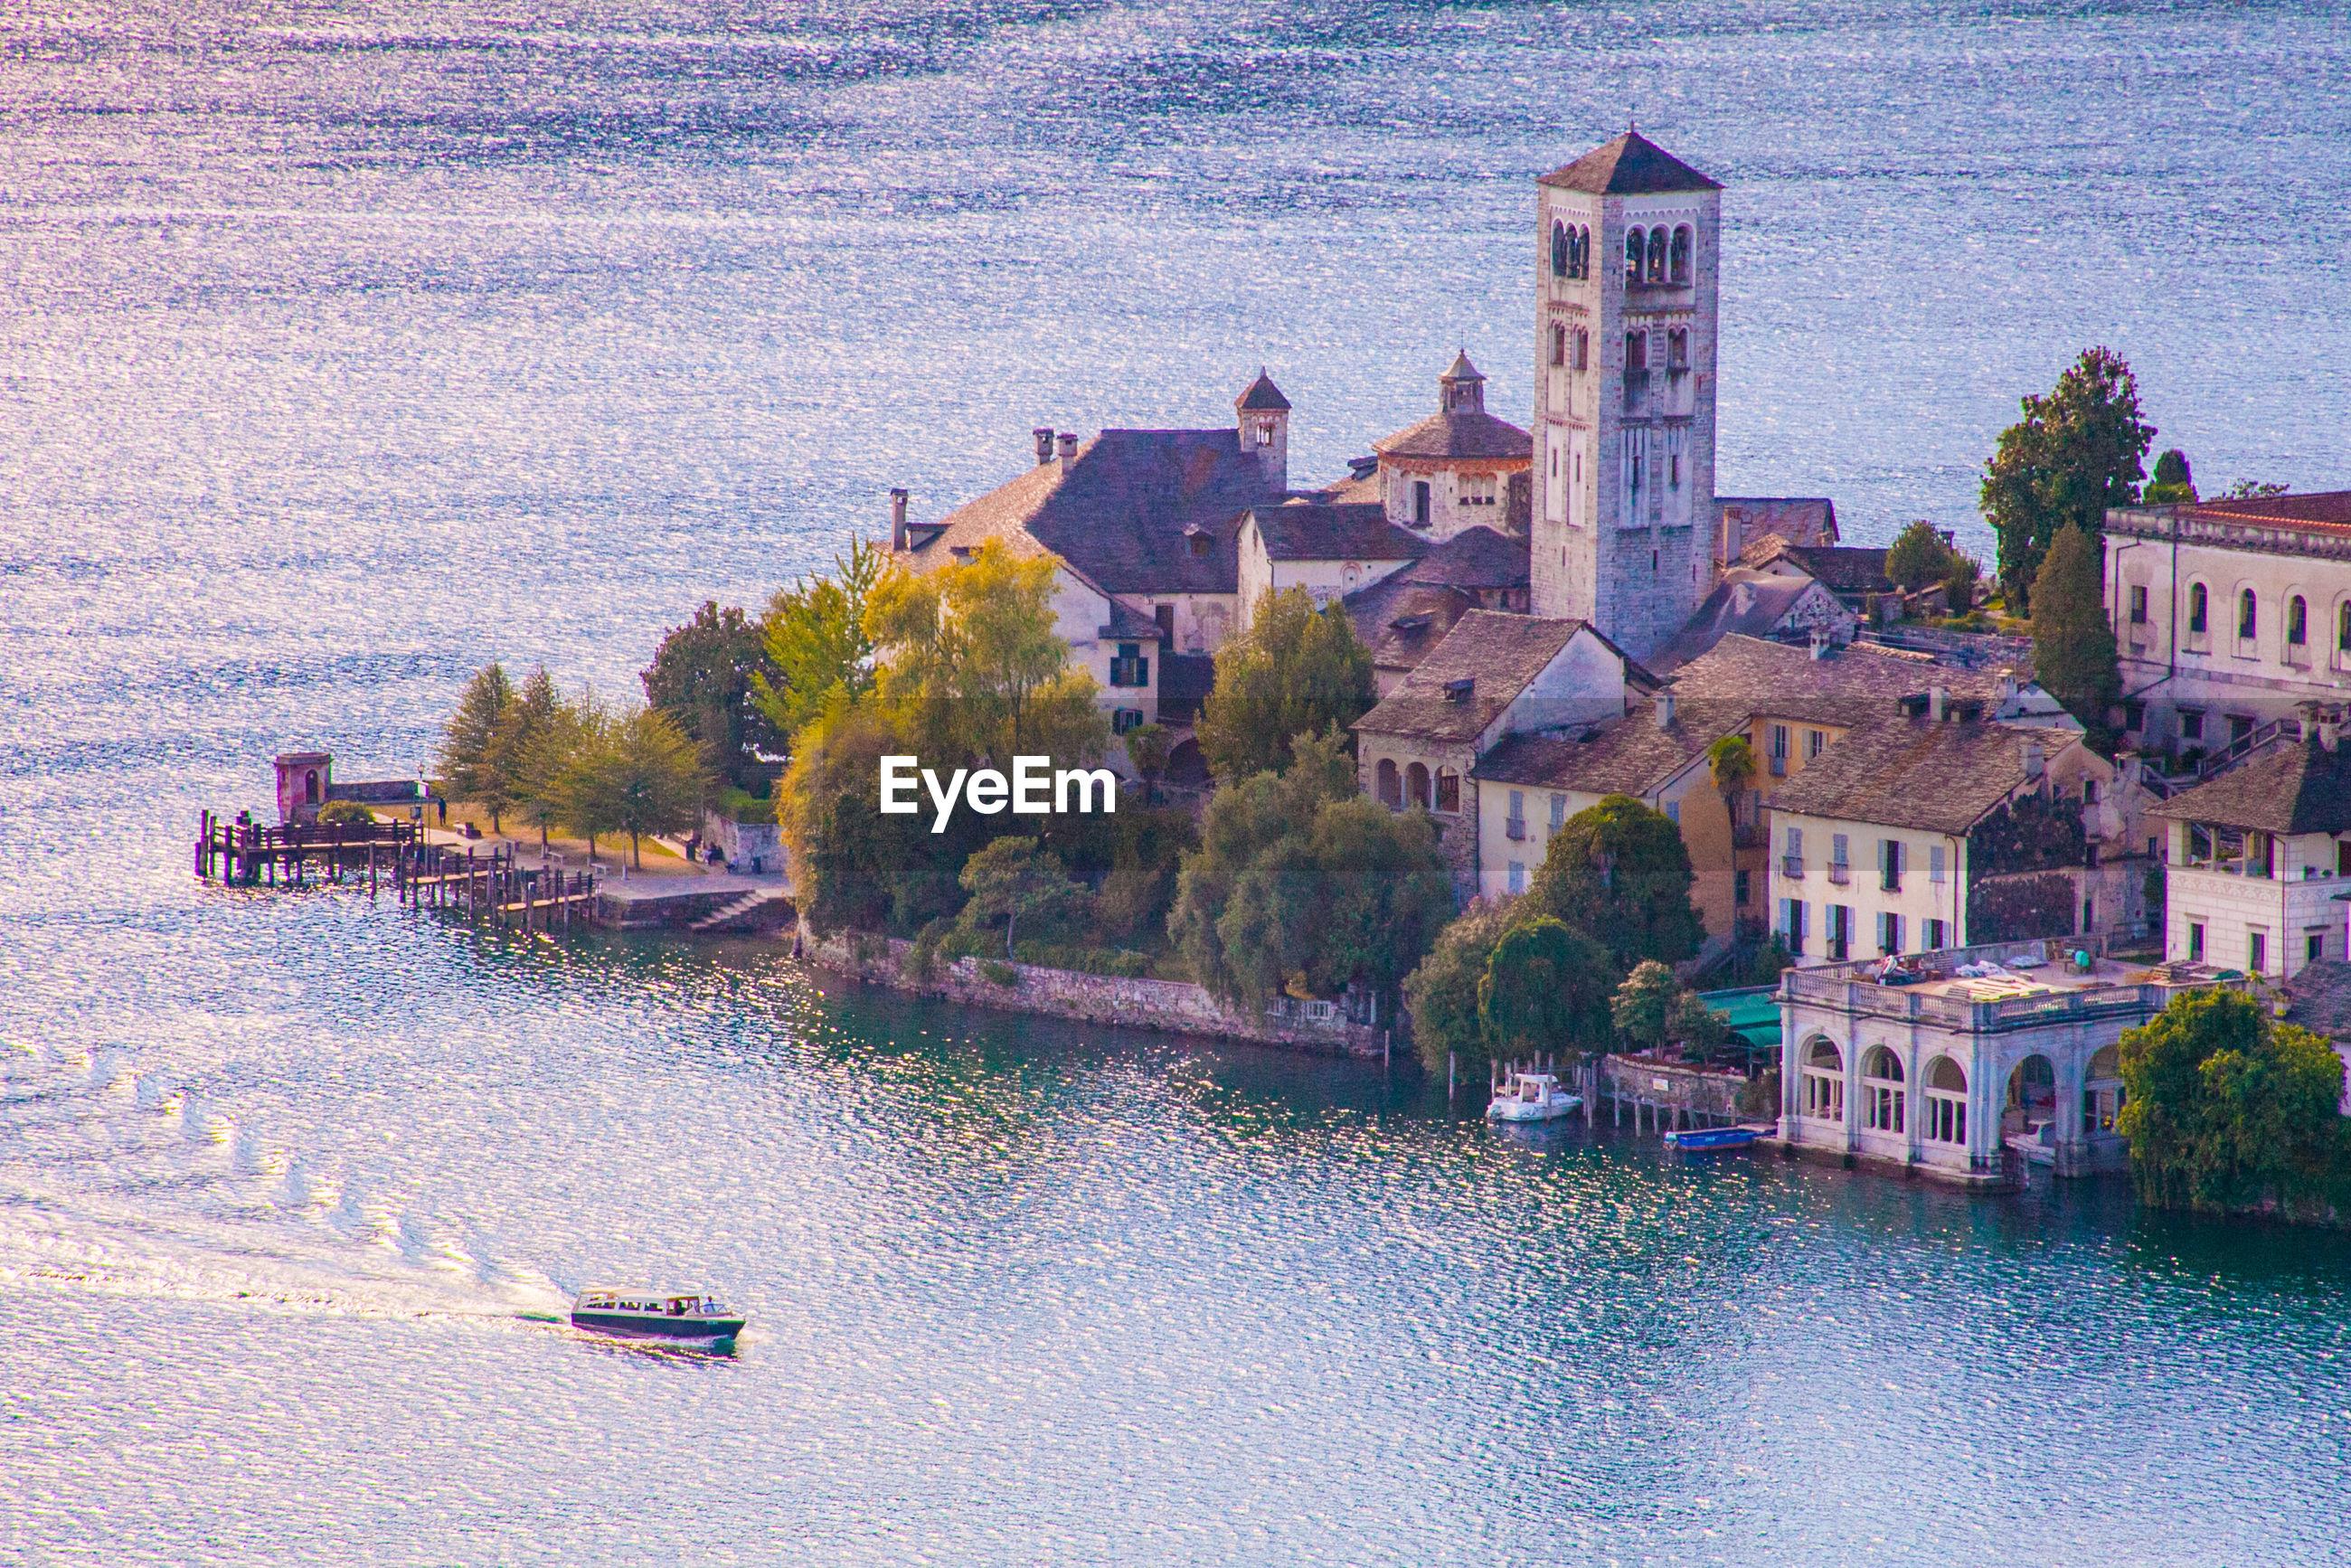 Scenic view of isola san giulio inside orta's lake, piemonte, italy.